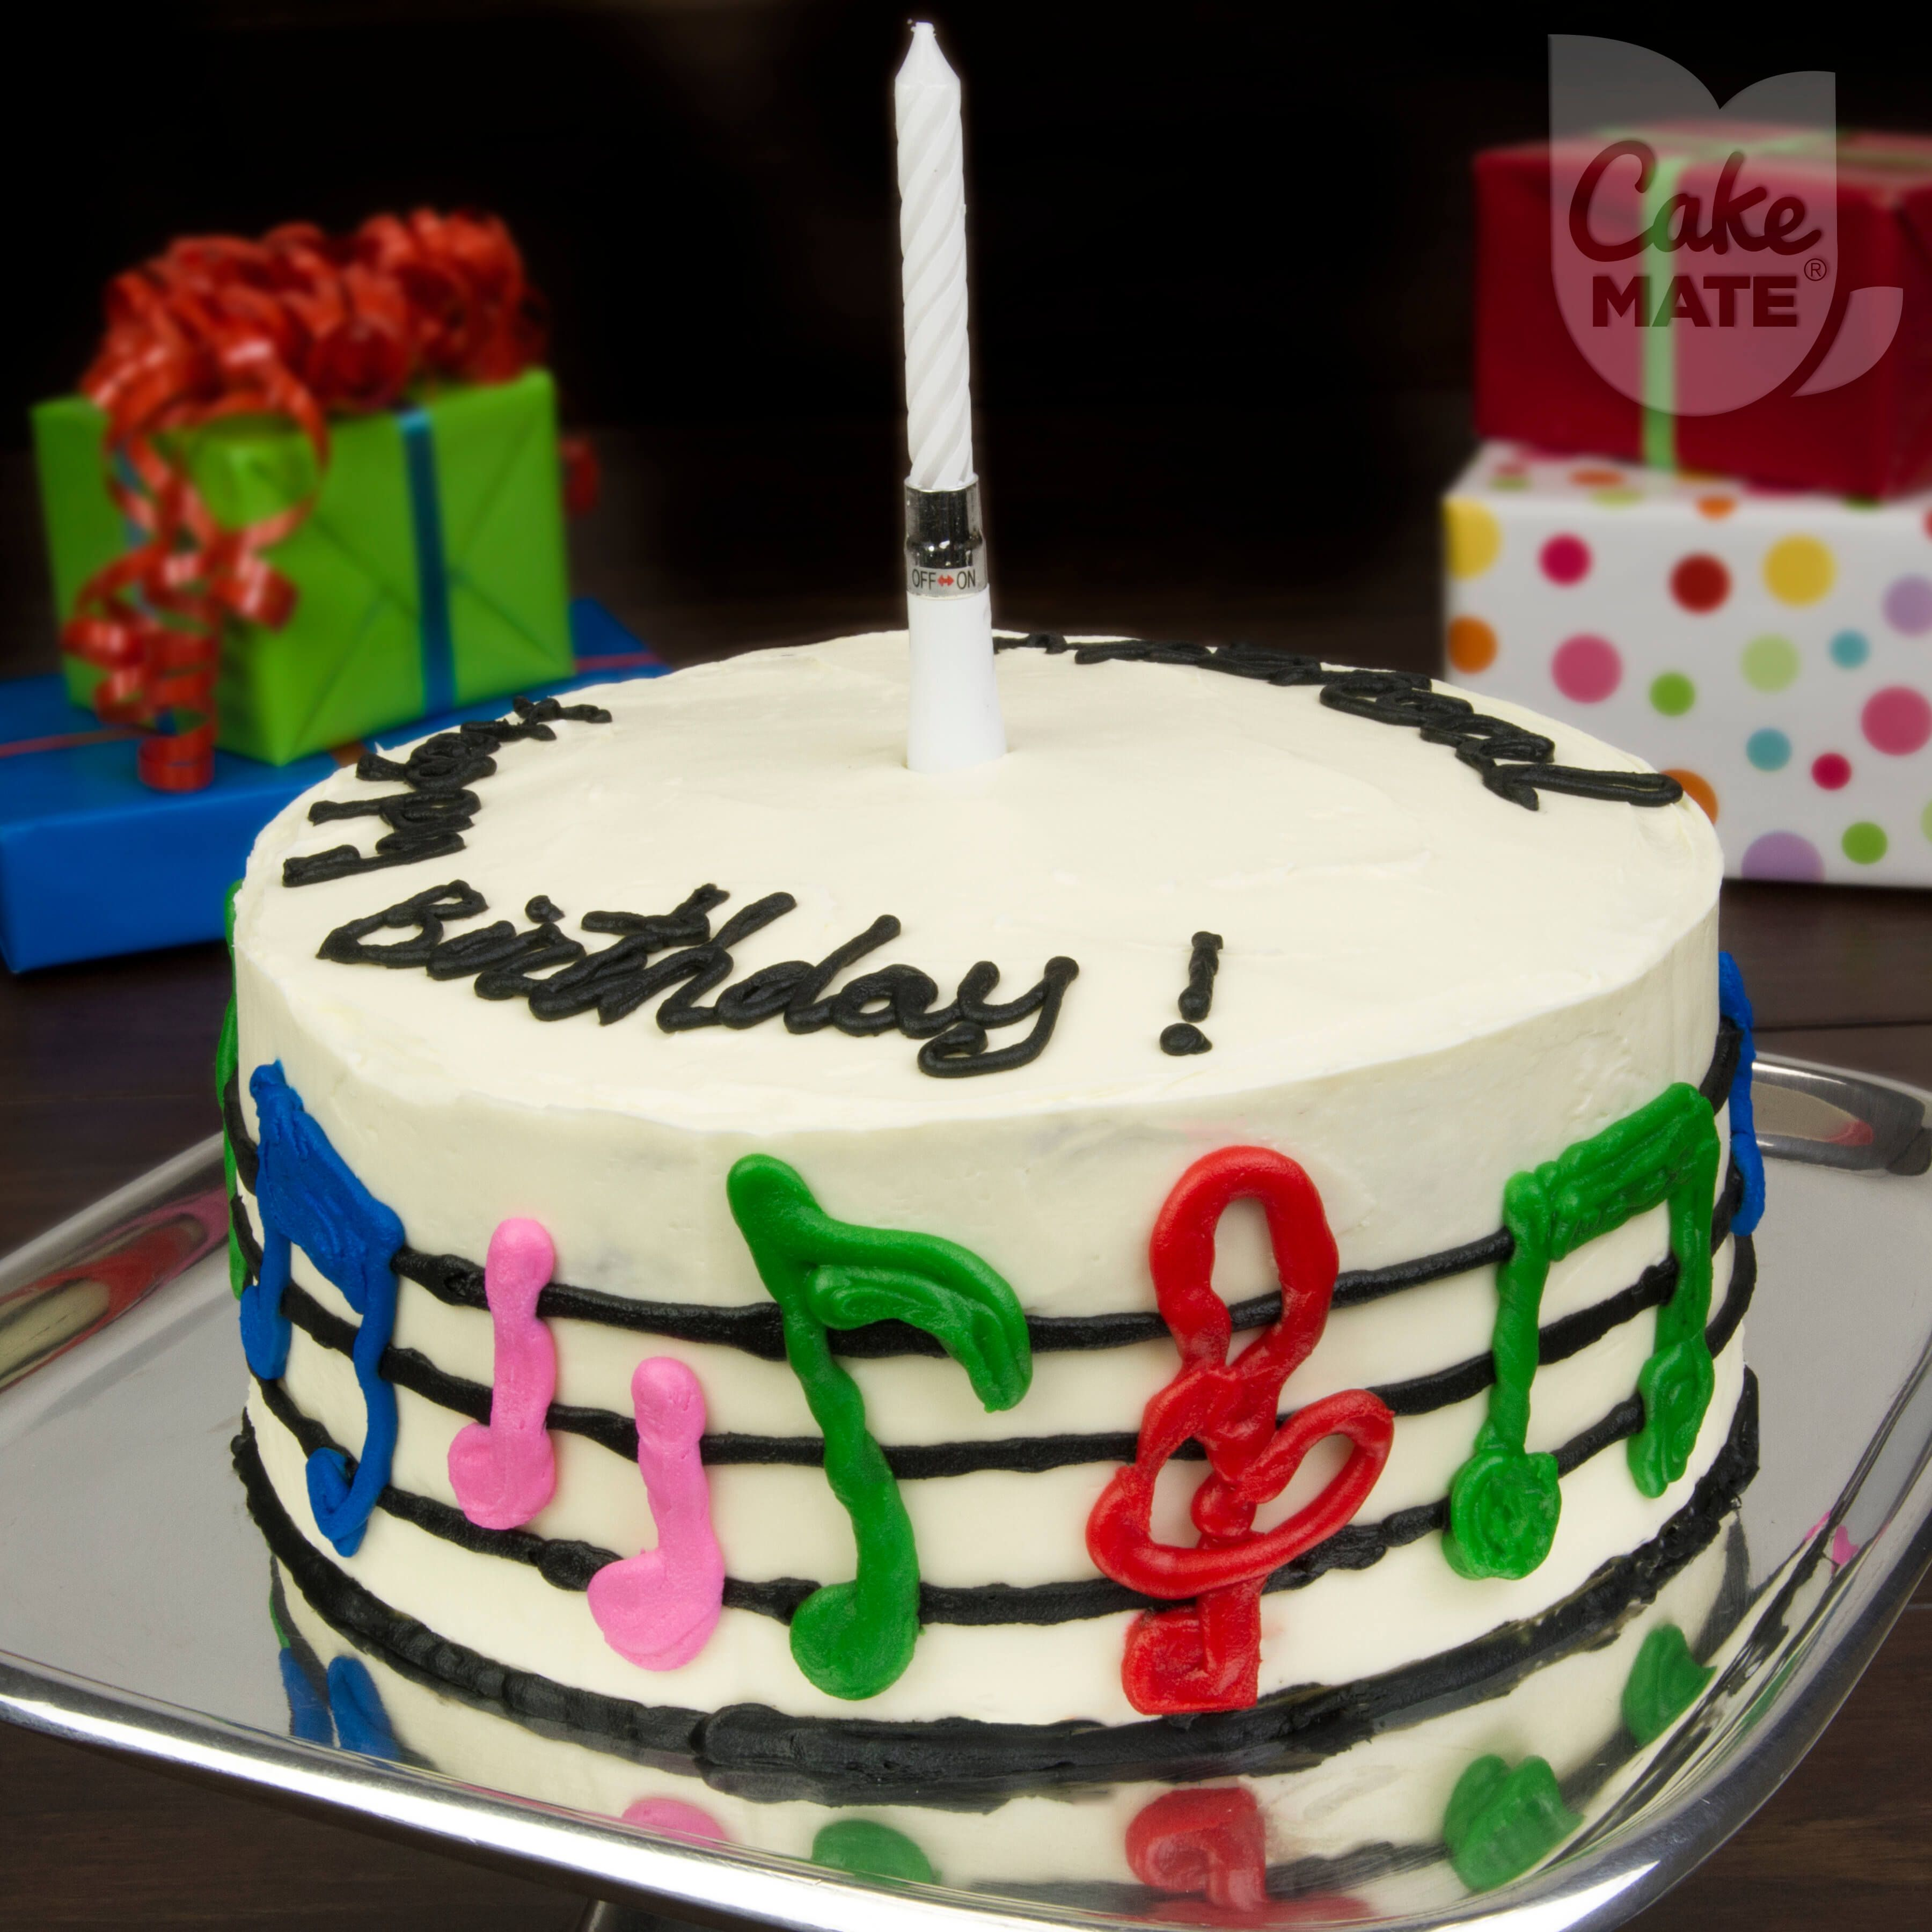 Musician S Musical Cake Simple Cake Designs Easy Cake Cake Mix Ingredients Simple Cake Designs